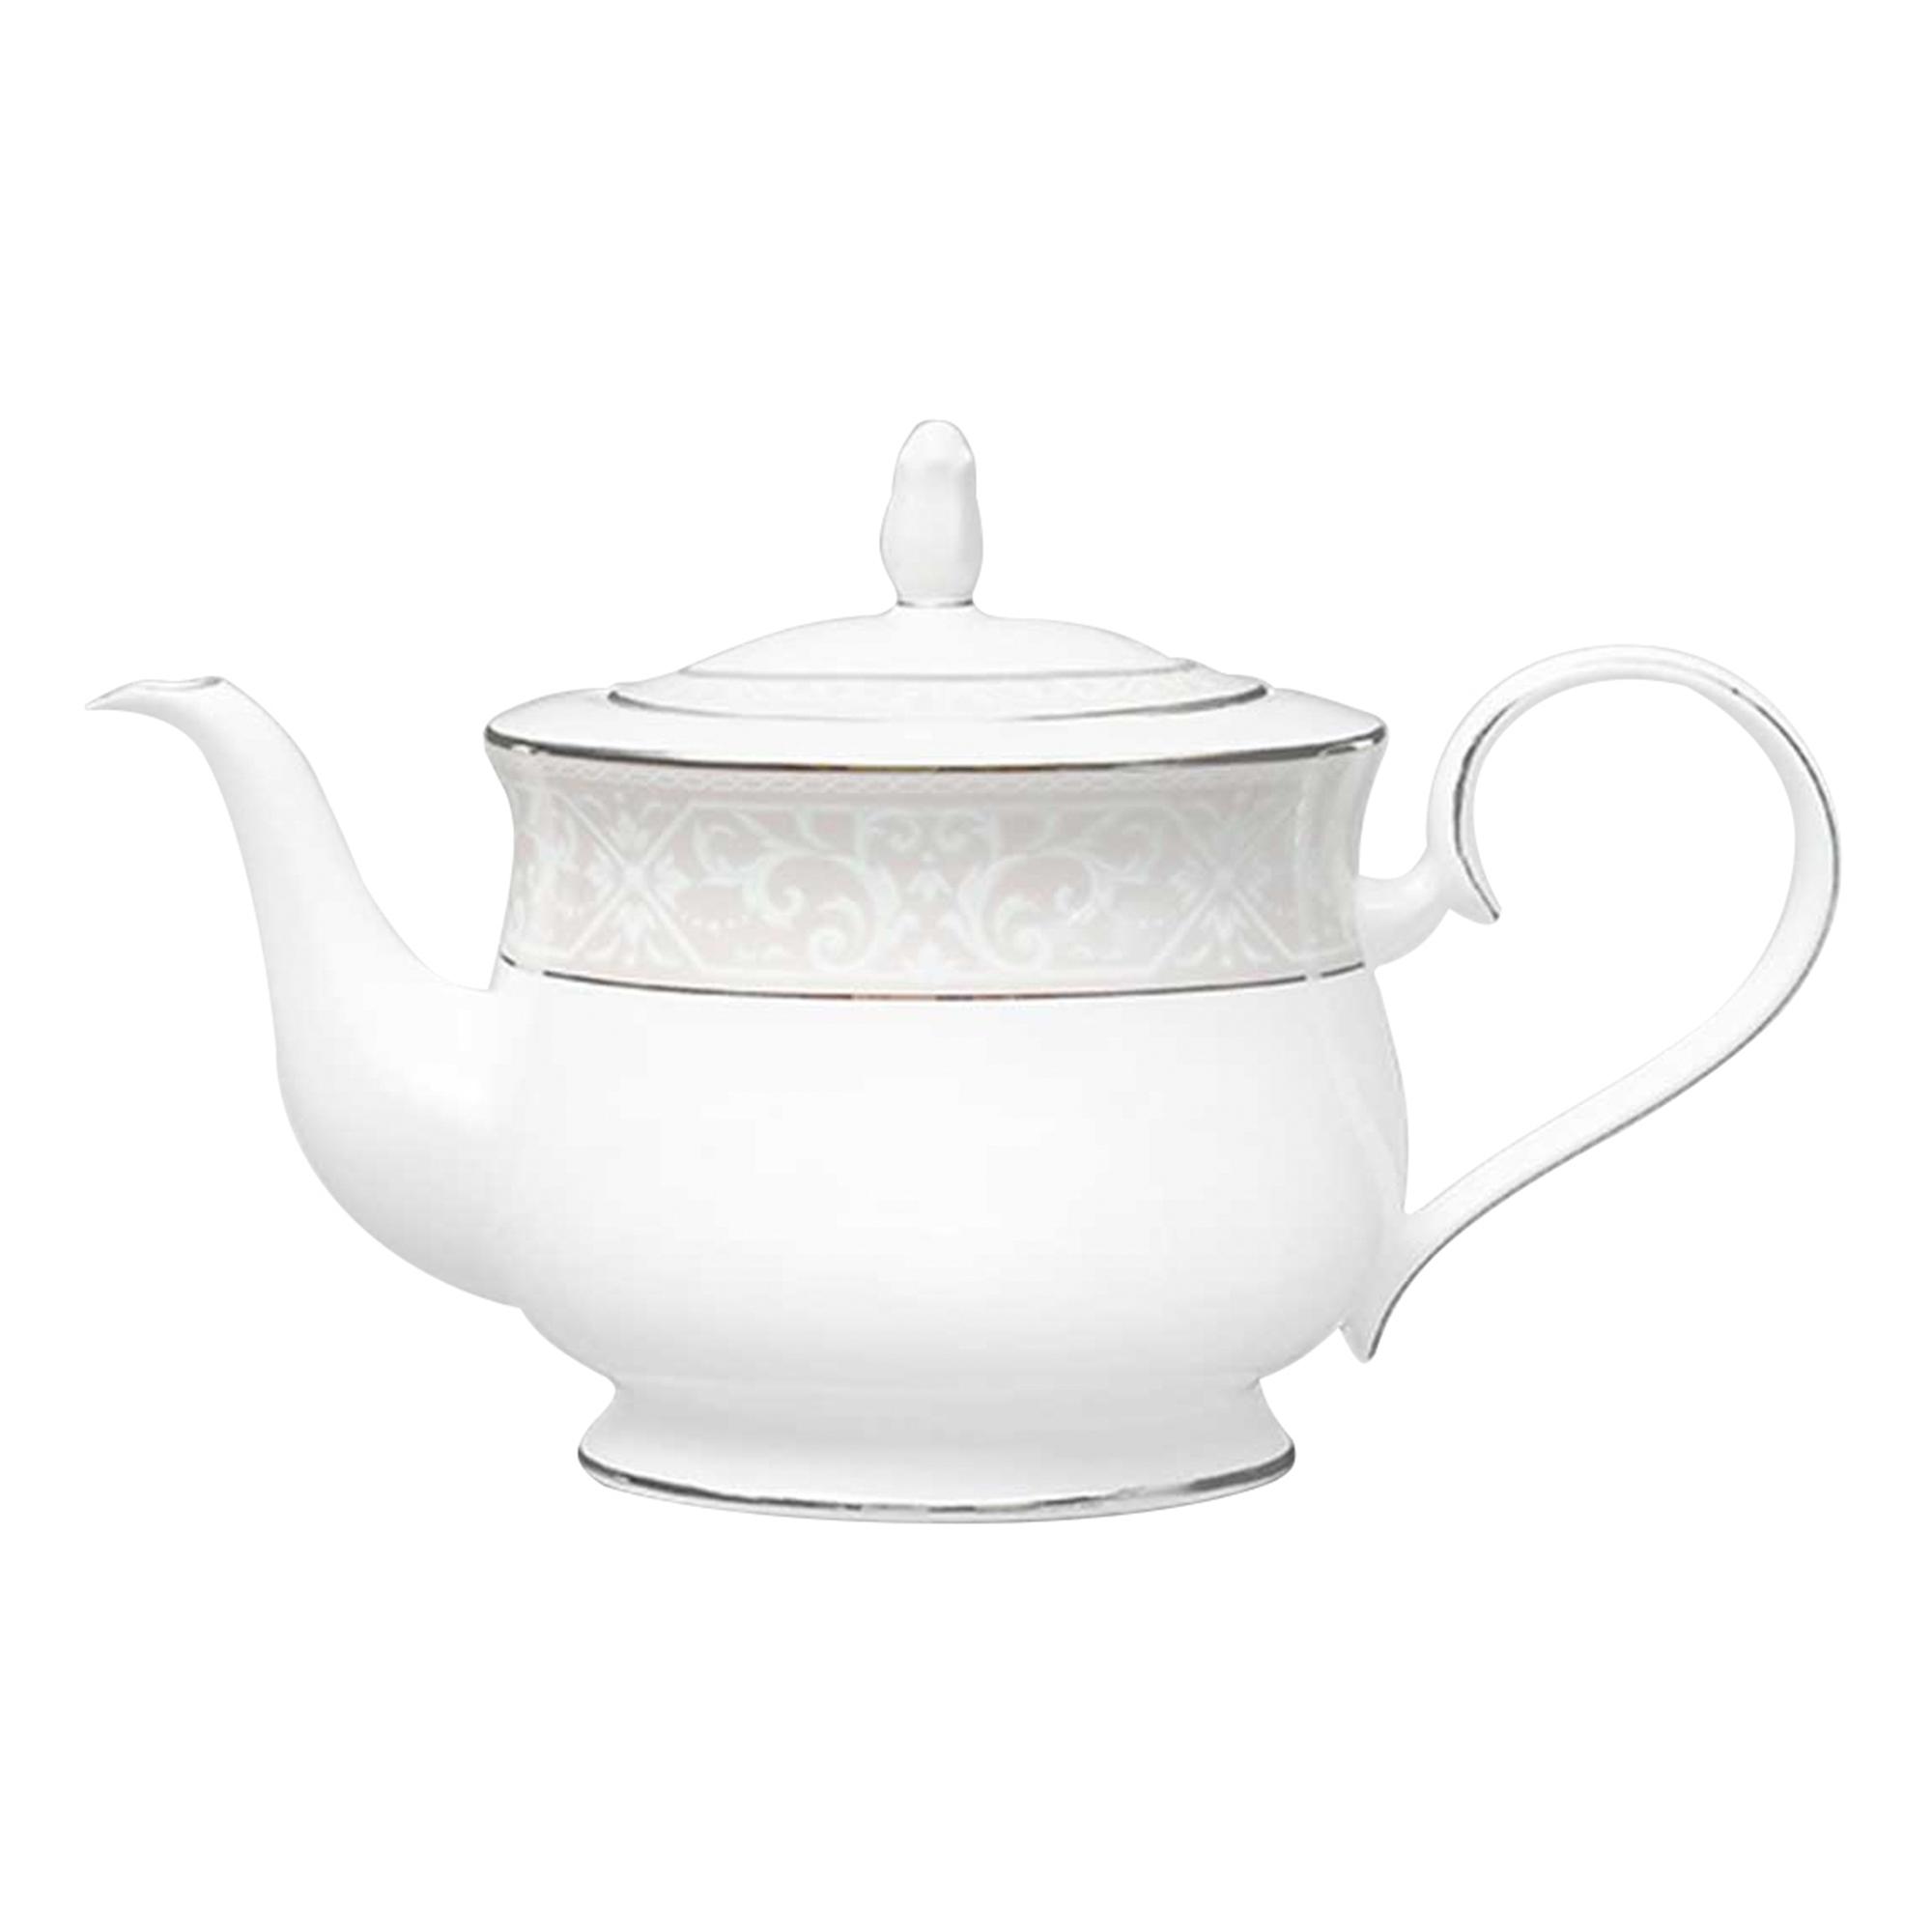 Чайник заварочный Noritake Монтвейл платиновый кант 1 л заварочный чайник 1 5 л lilac 5520010 1